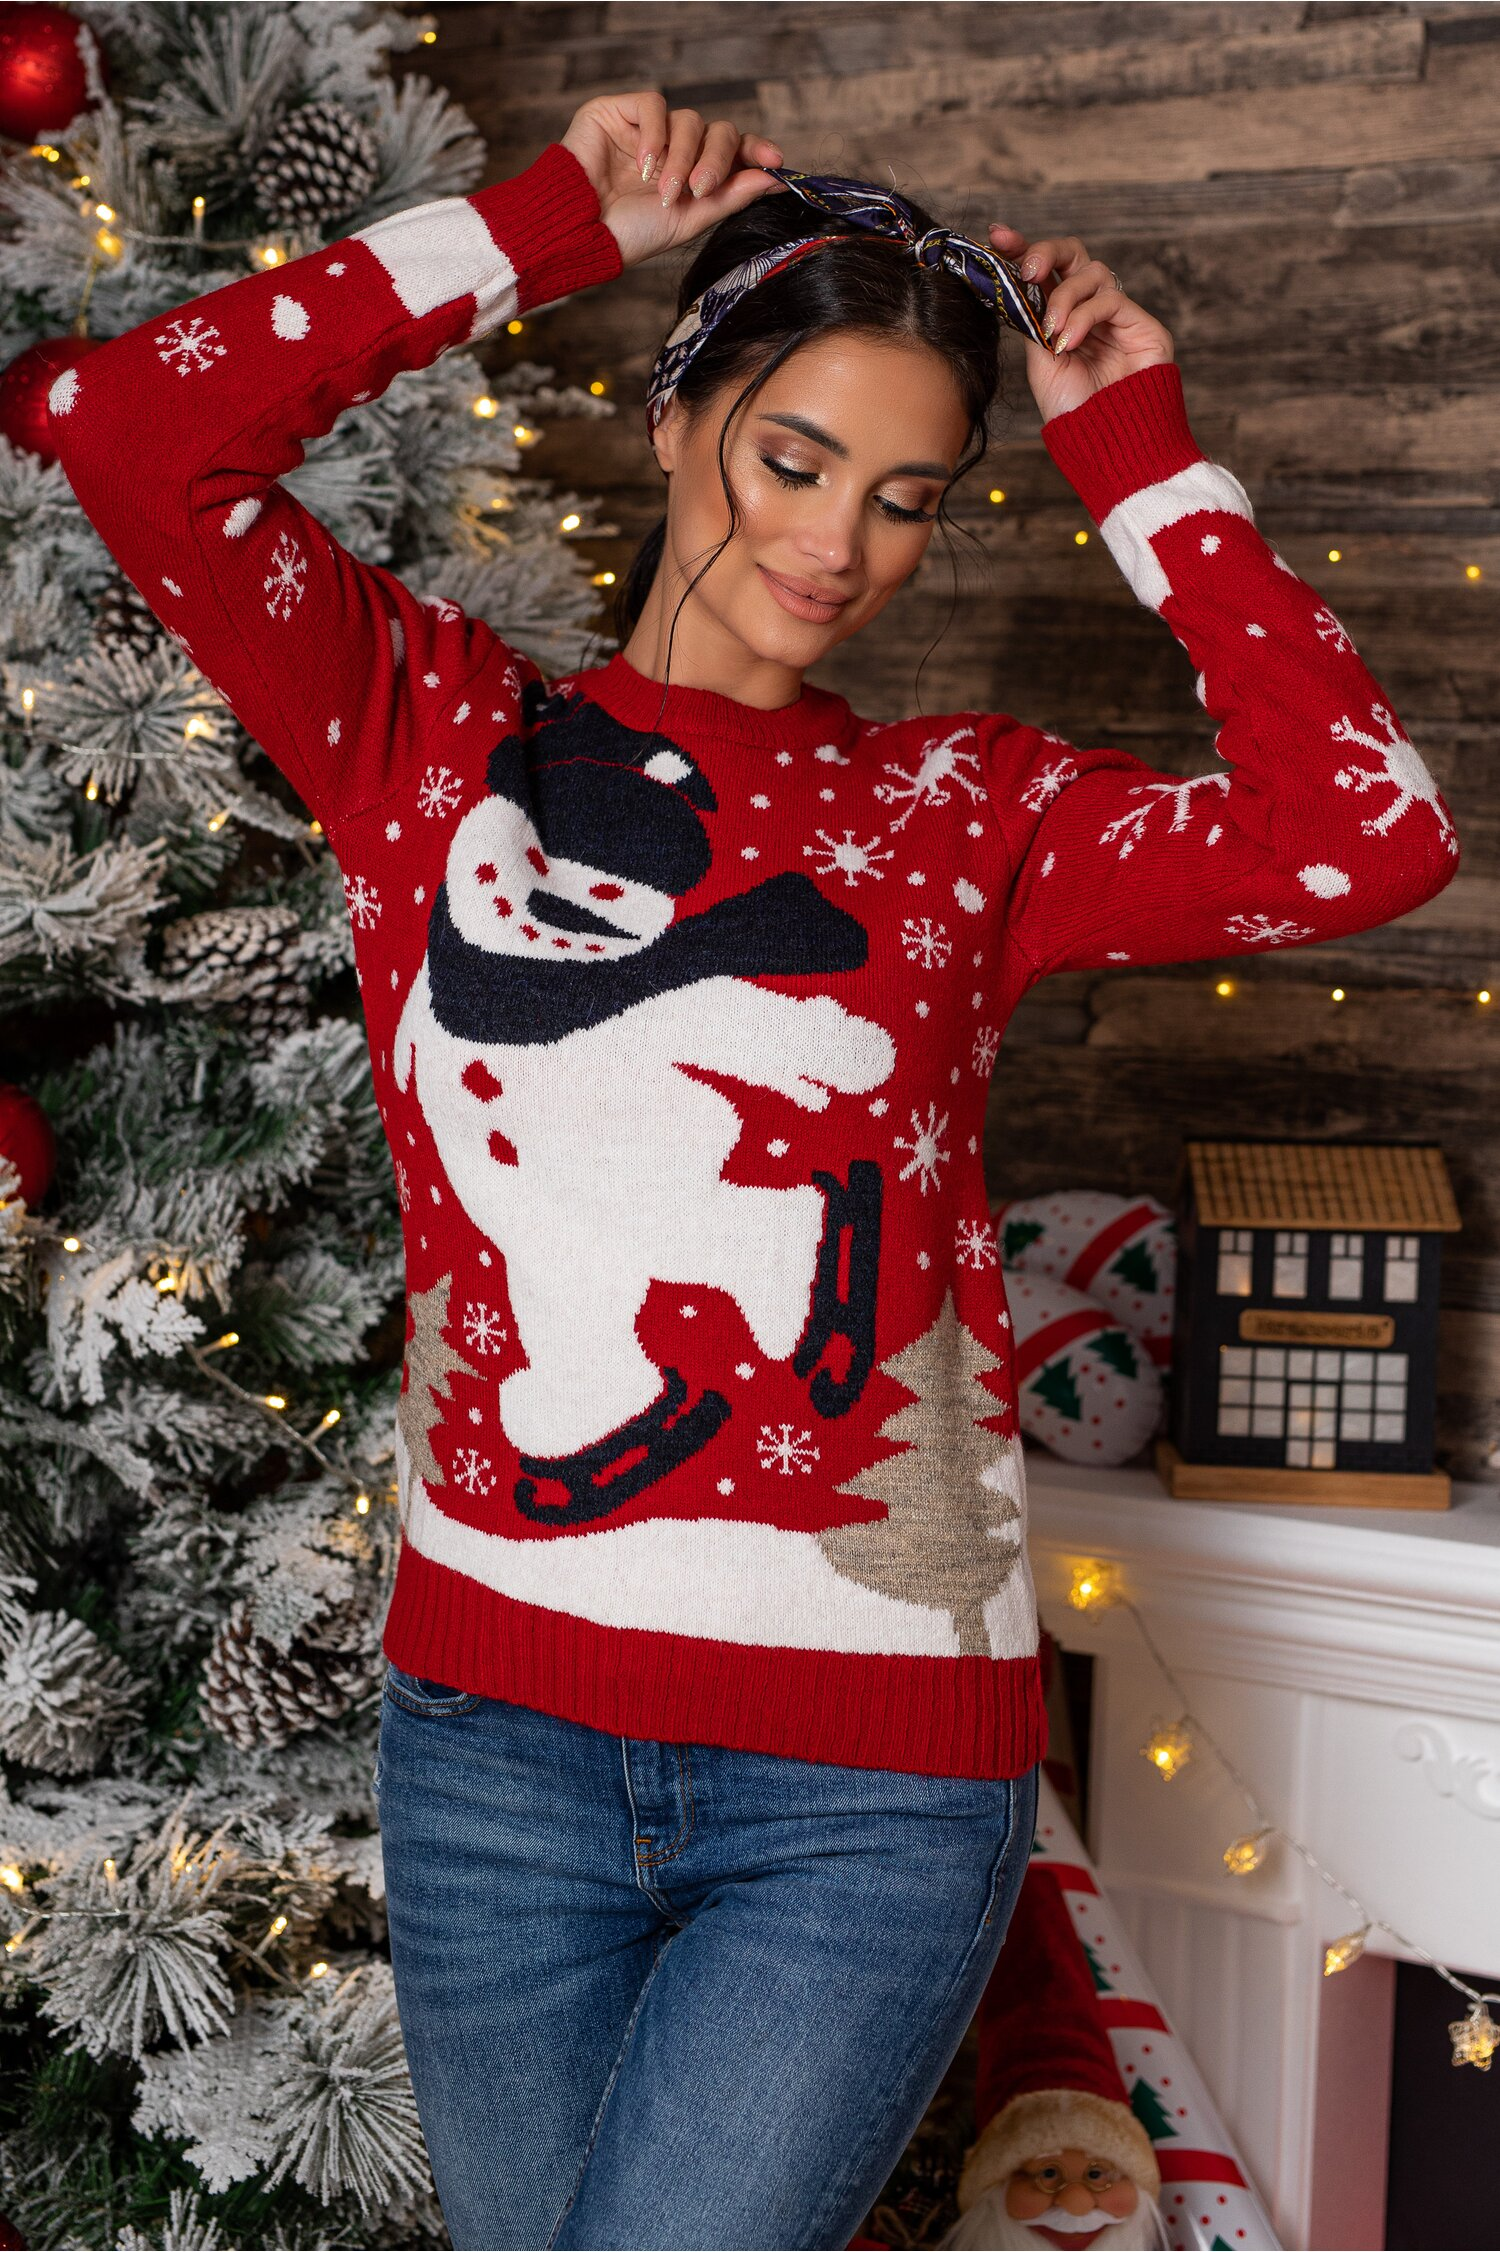 Bluza Snowman rosie cu imprimeu de iarna Idei Cadouri de Craciun Online